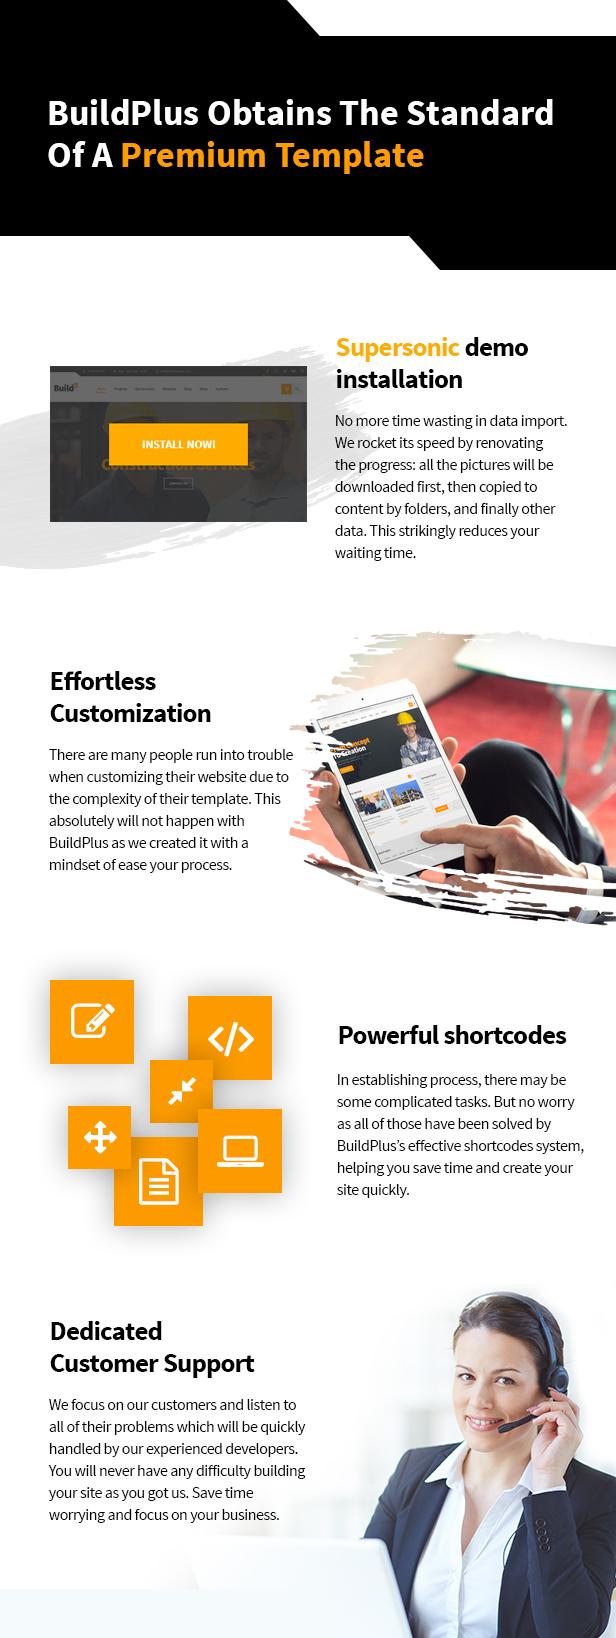 WordPress Theme: Engineering Construction Buildings. Premium templates